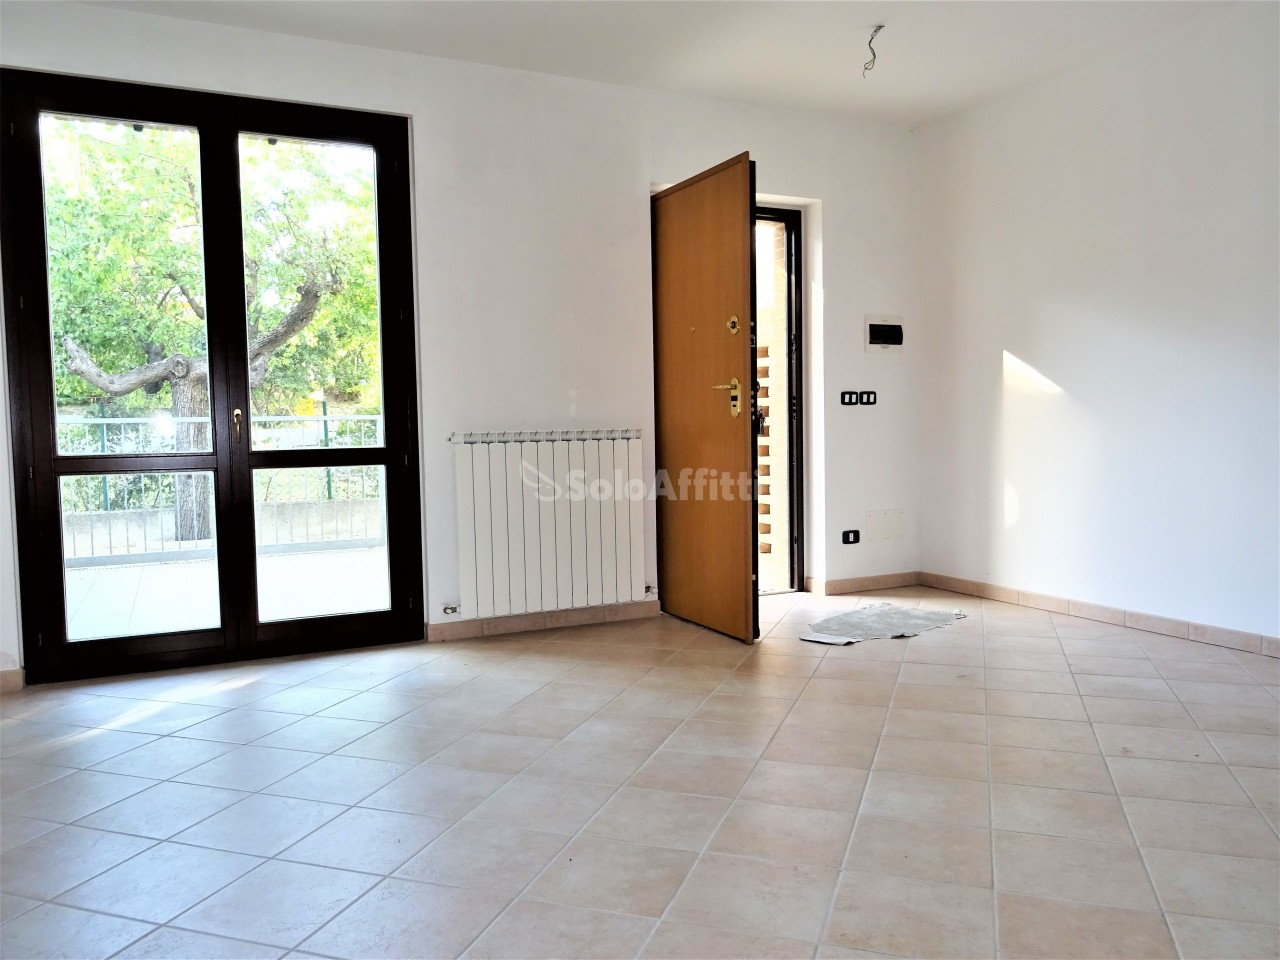 Appartamento in affitto a Ostra (AN)